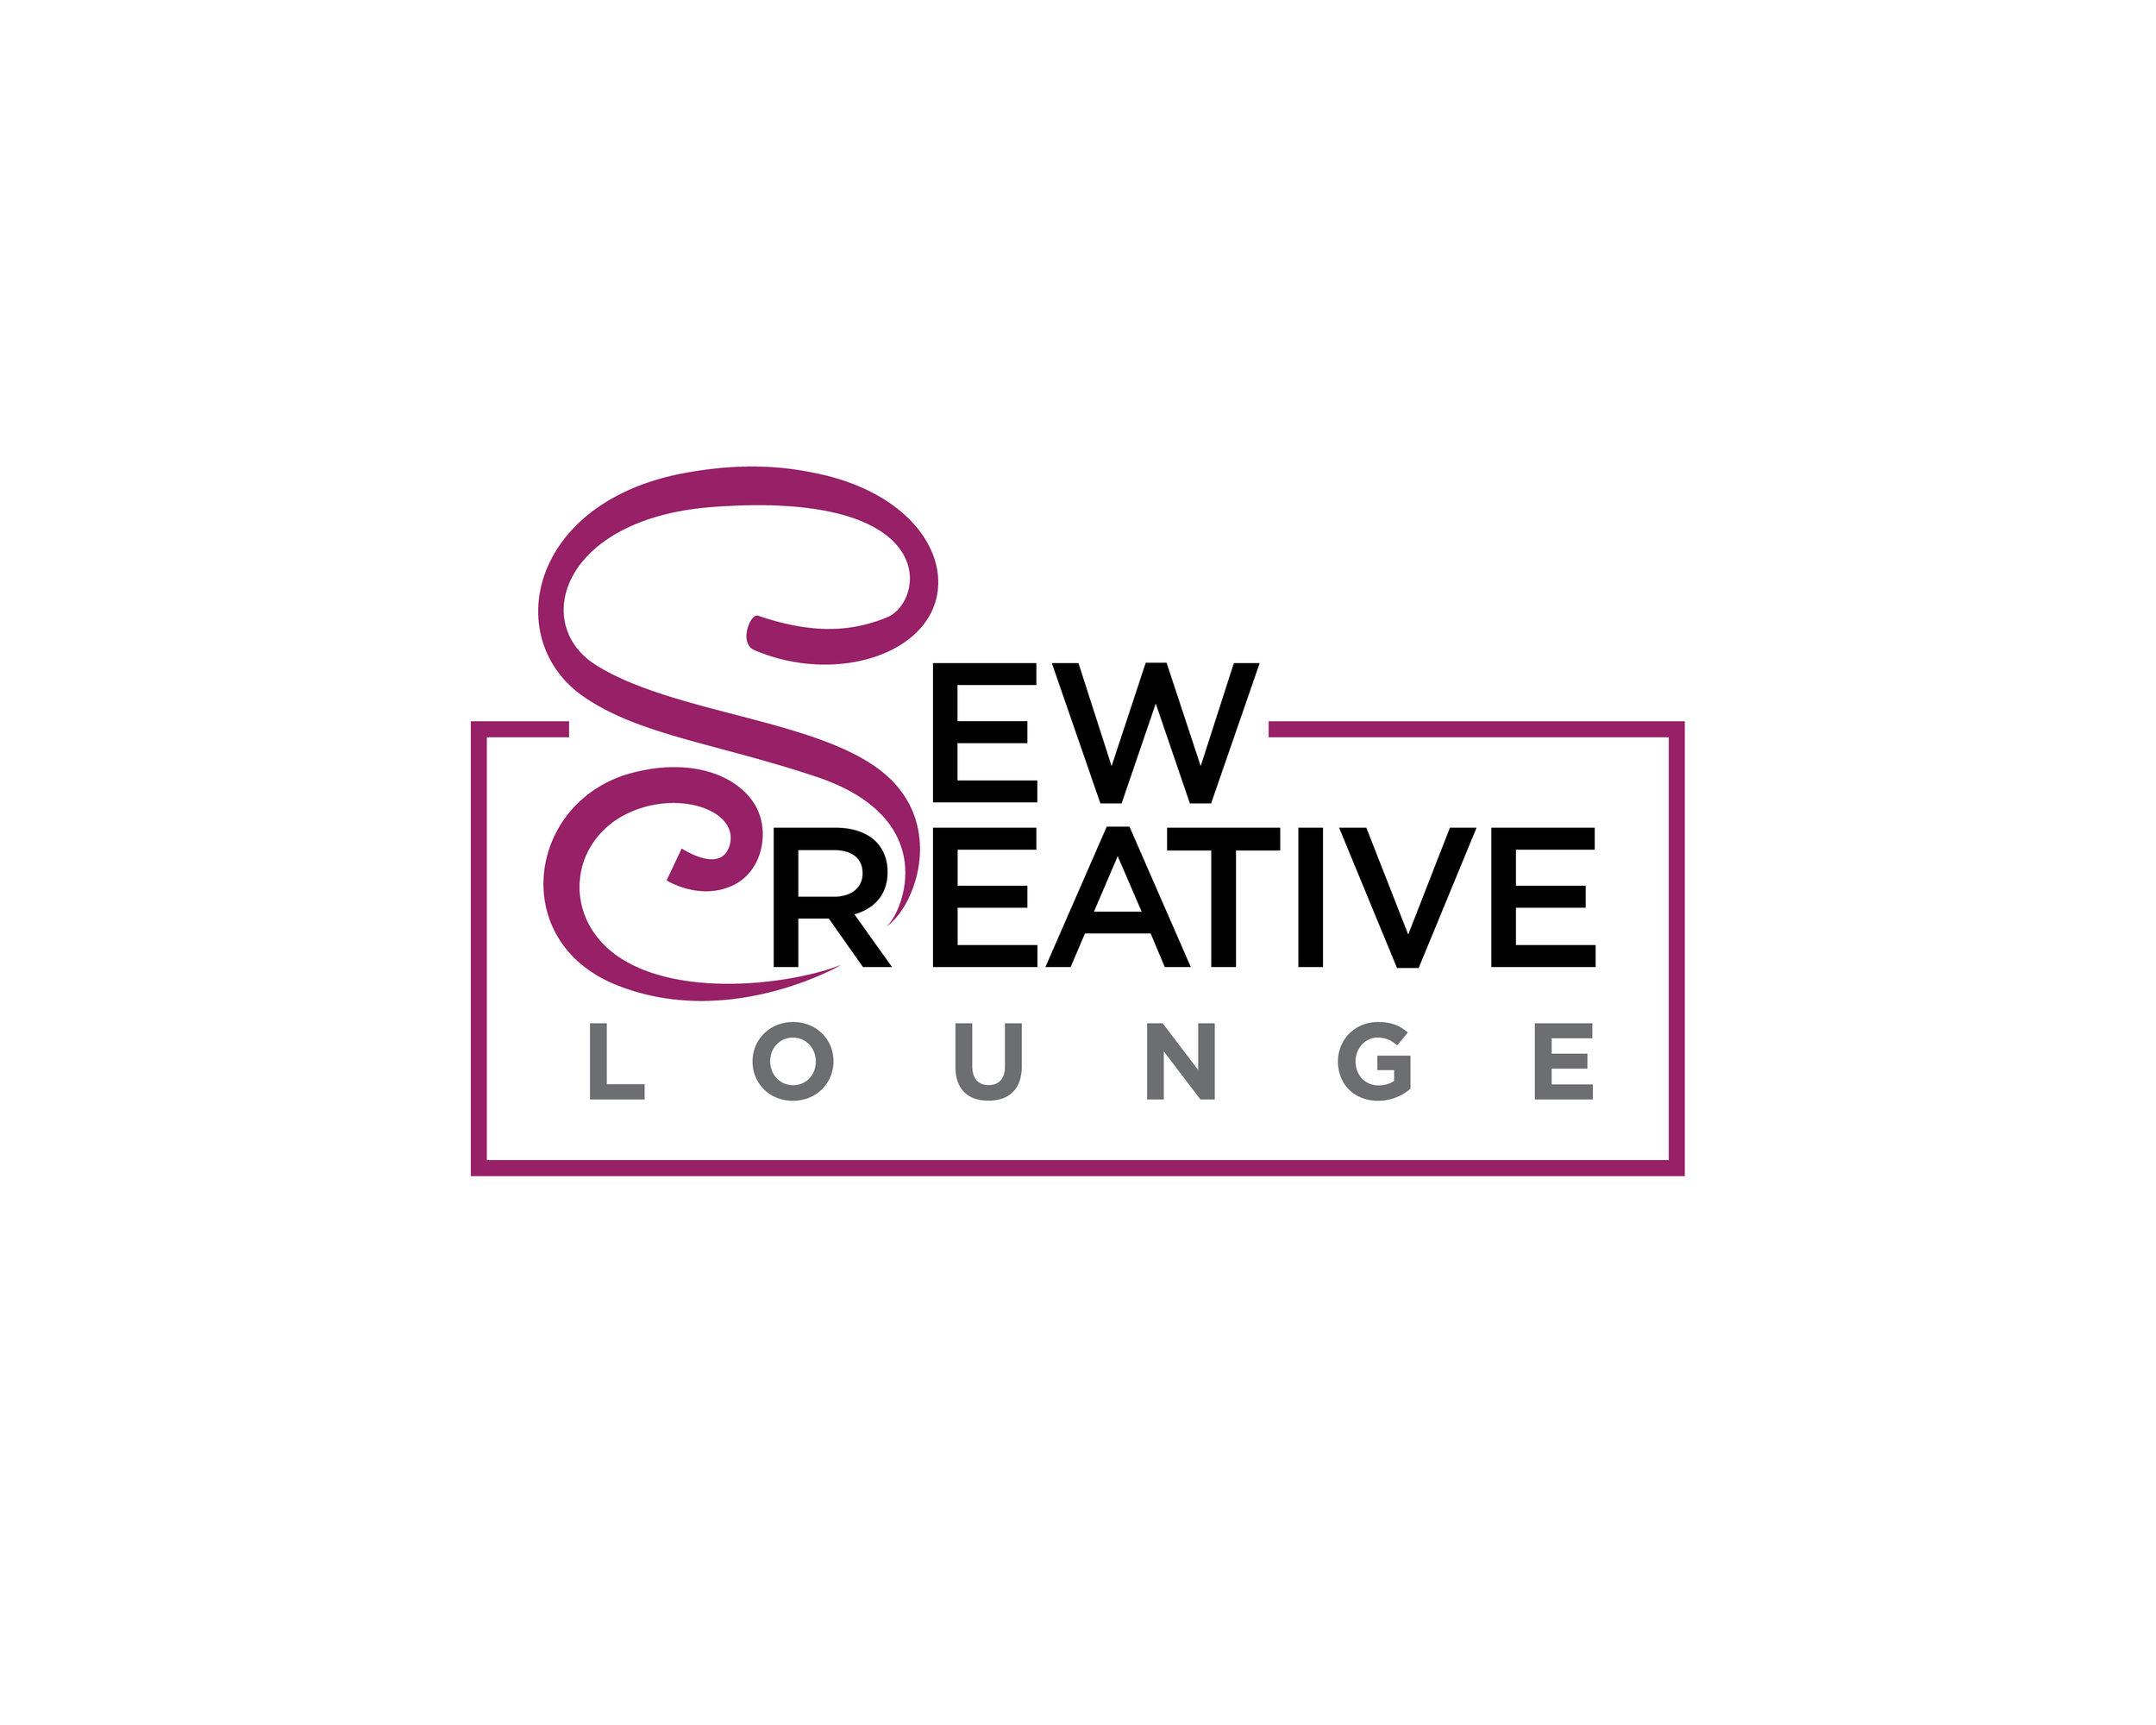 sew-creative-box-01.jpg